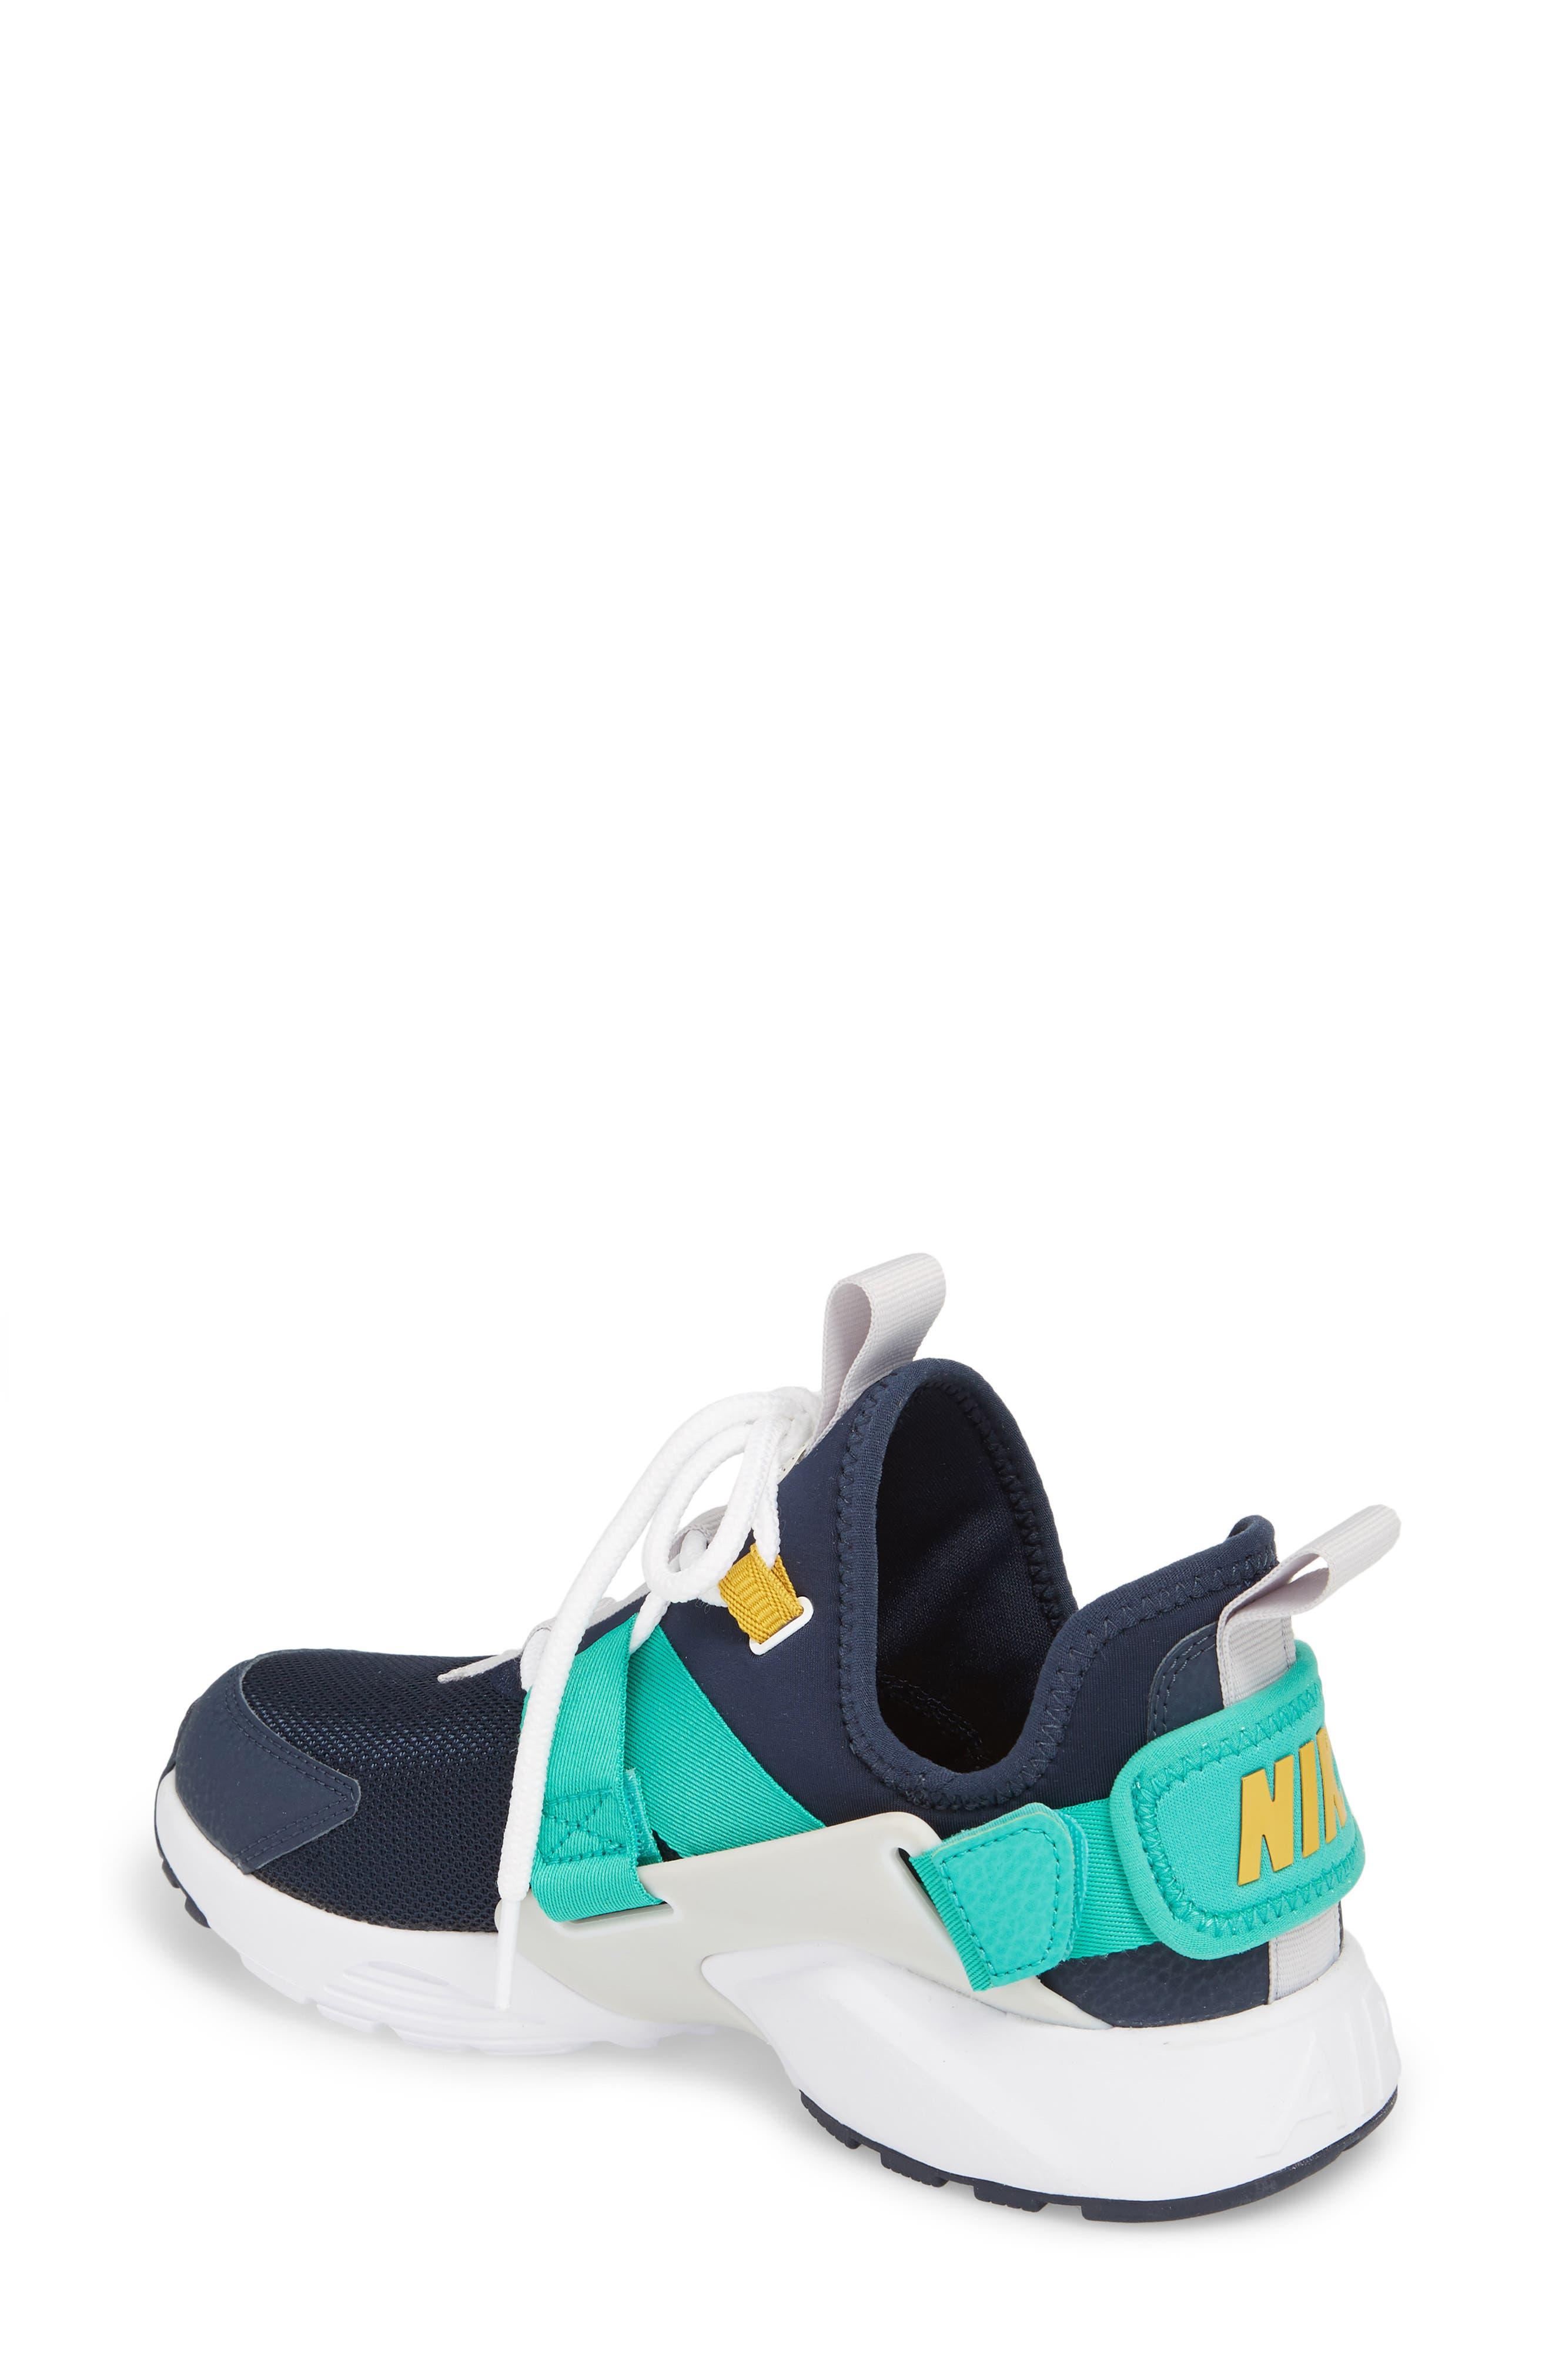 Air Huarache City Low Sneaker,                             Alternate thumbnail 2, color,                             Obsidian/ White/ Grey/ Green